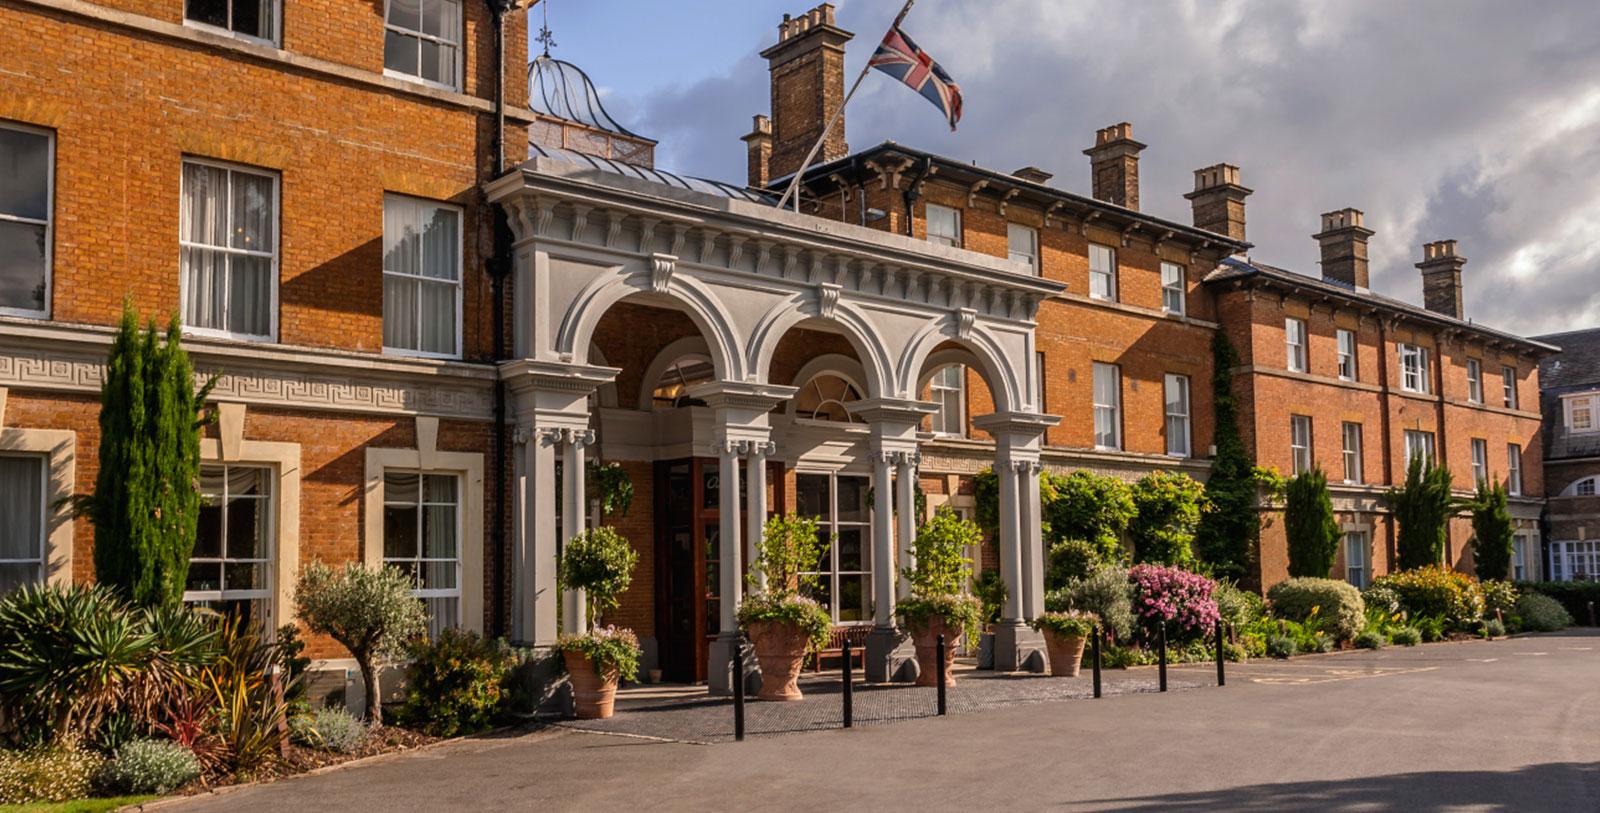 Image of Hotel Entrance Oatlands Park Hotel, 1856, Member of Historic Hotels Worldwide, in Weybridge, England, Overview